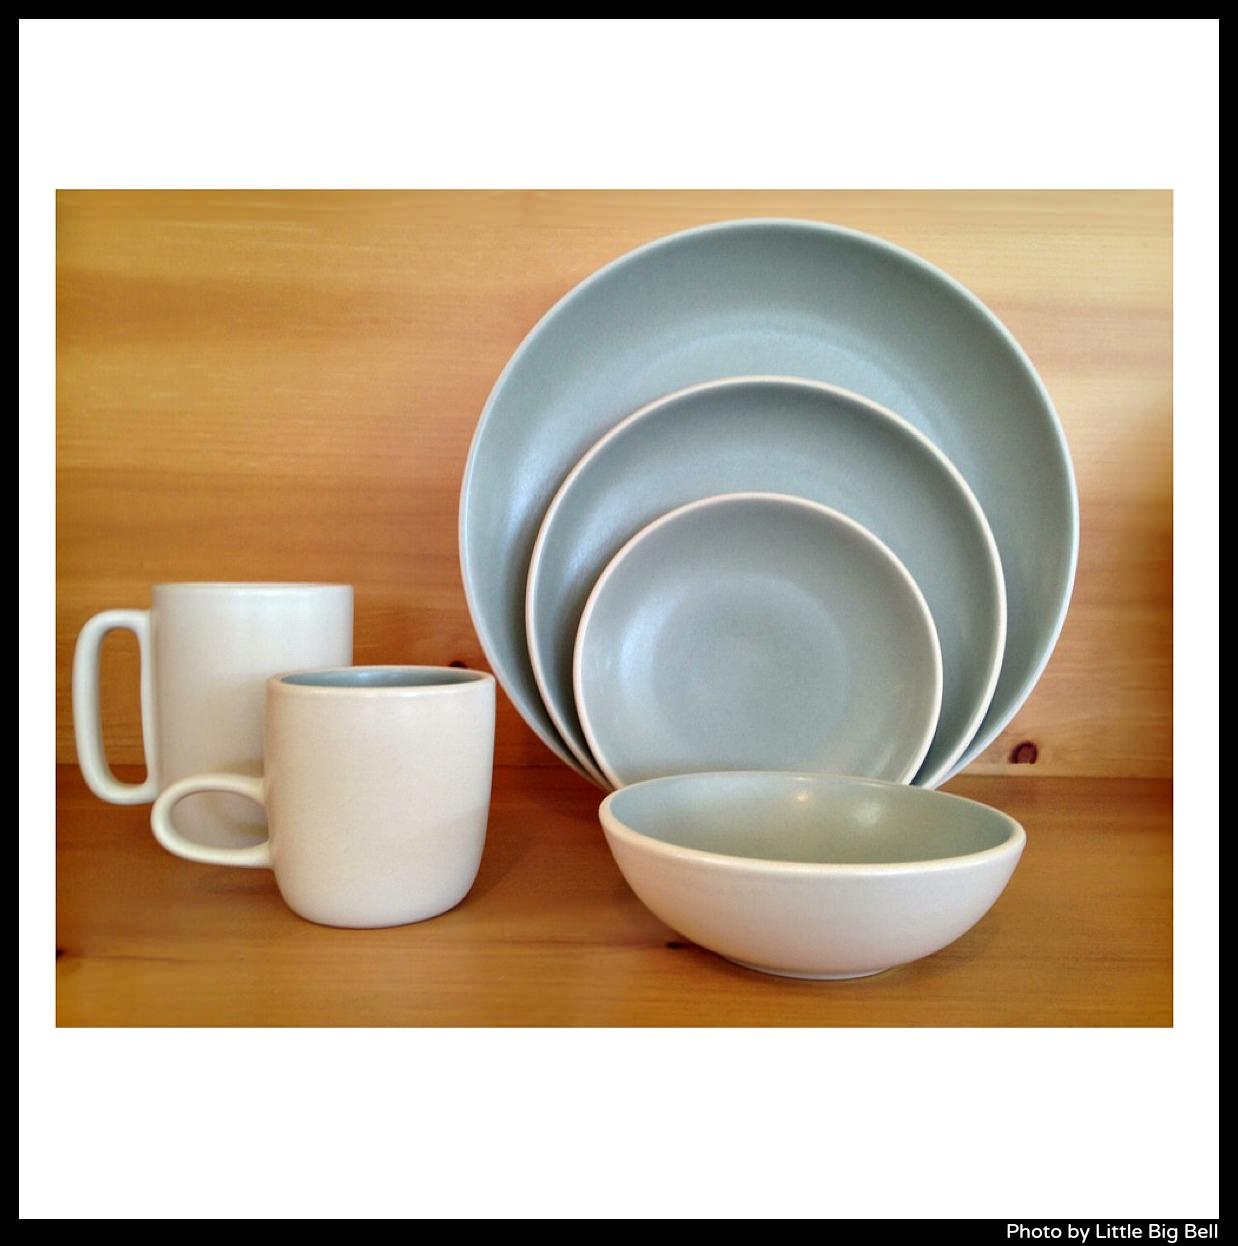 Heath Ceramics Dinnerware & Click Image To Zoom